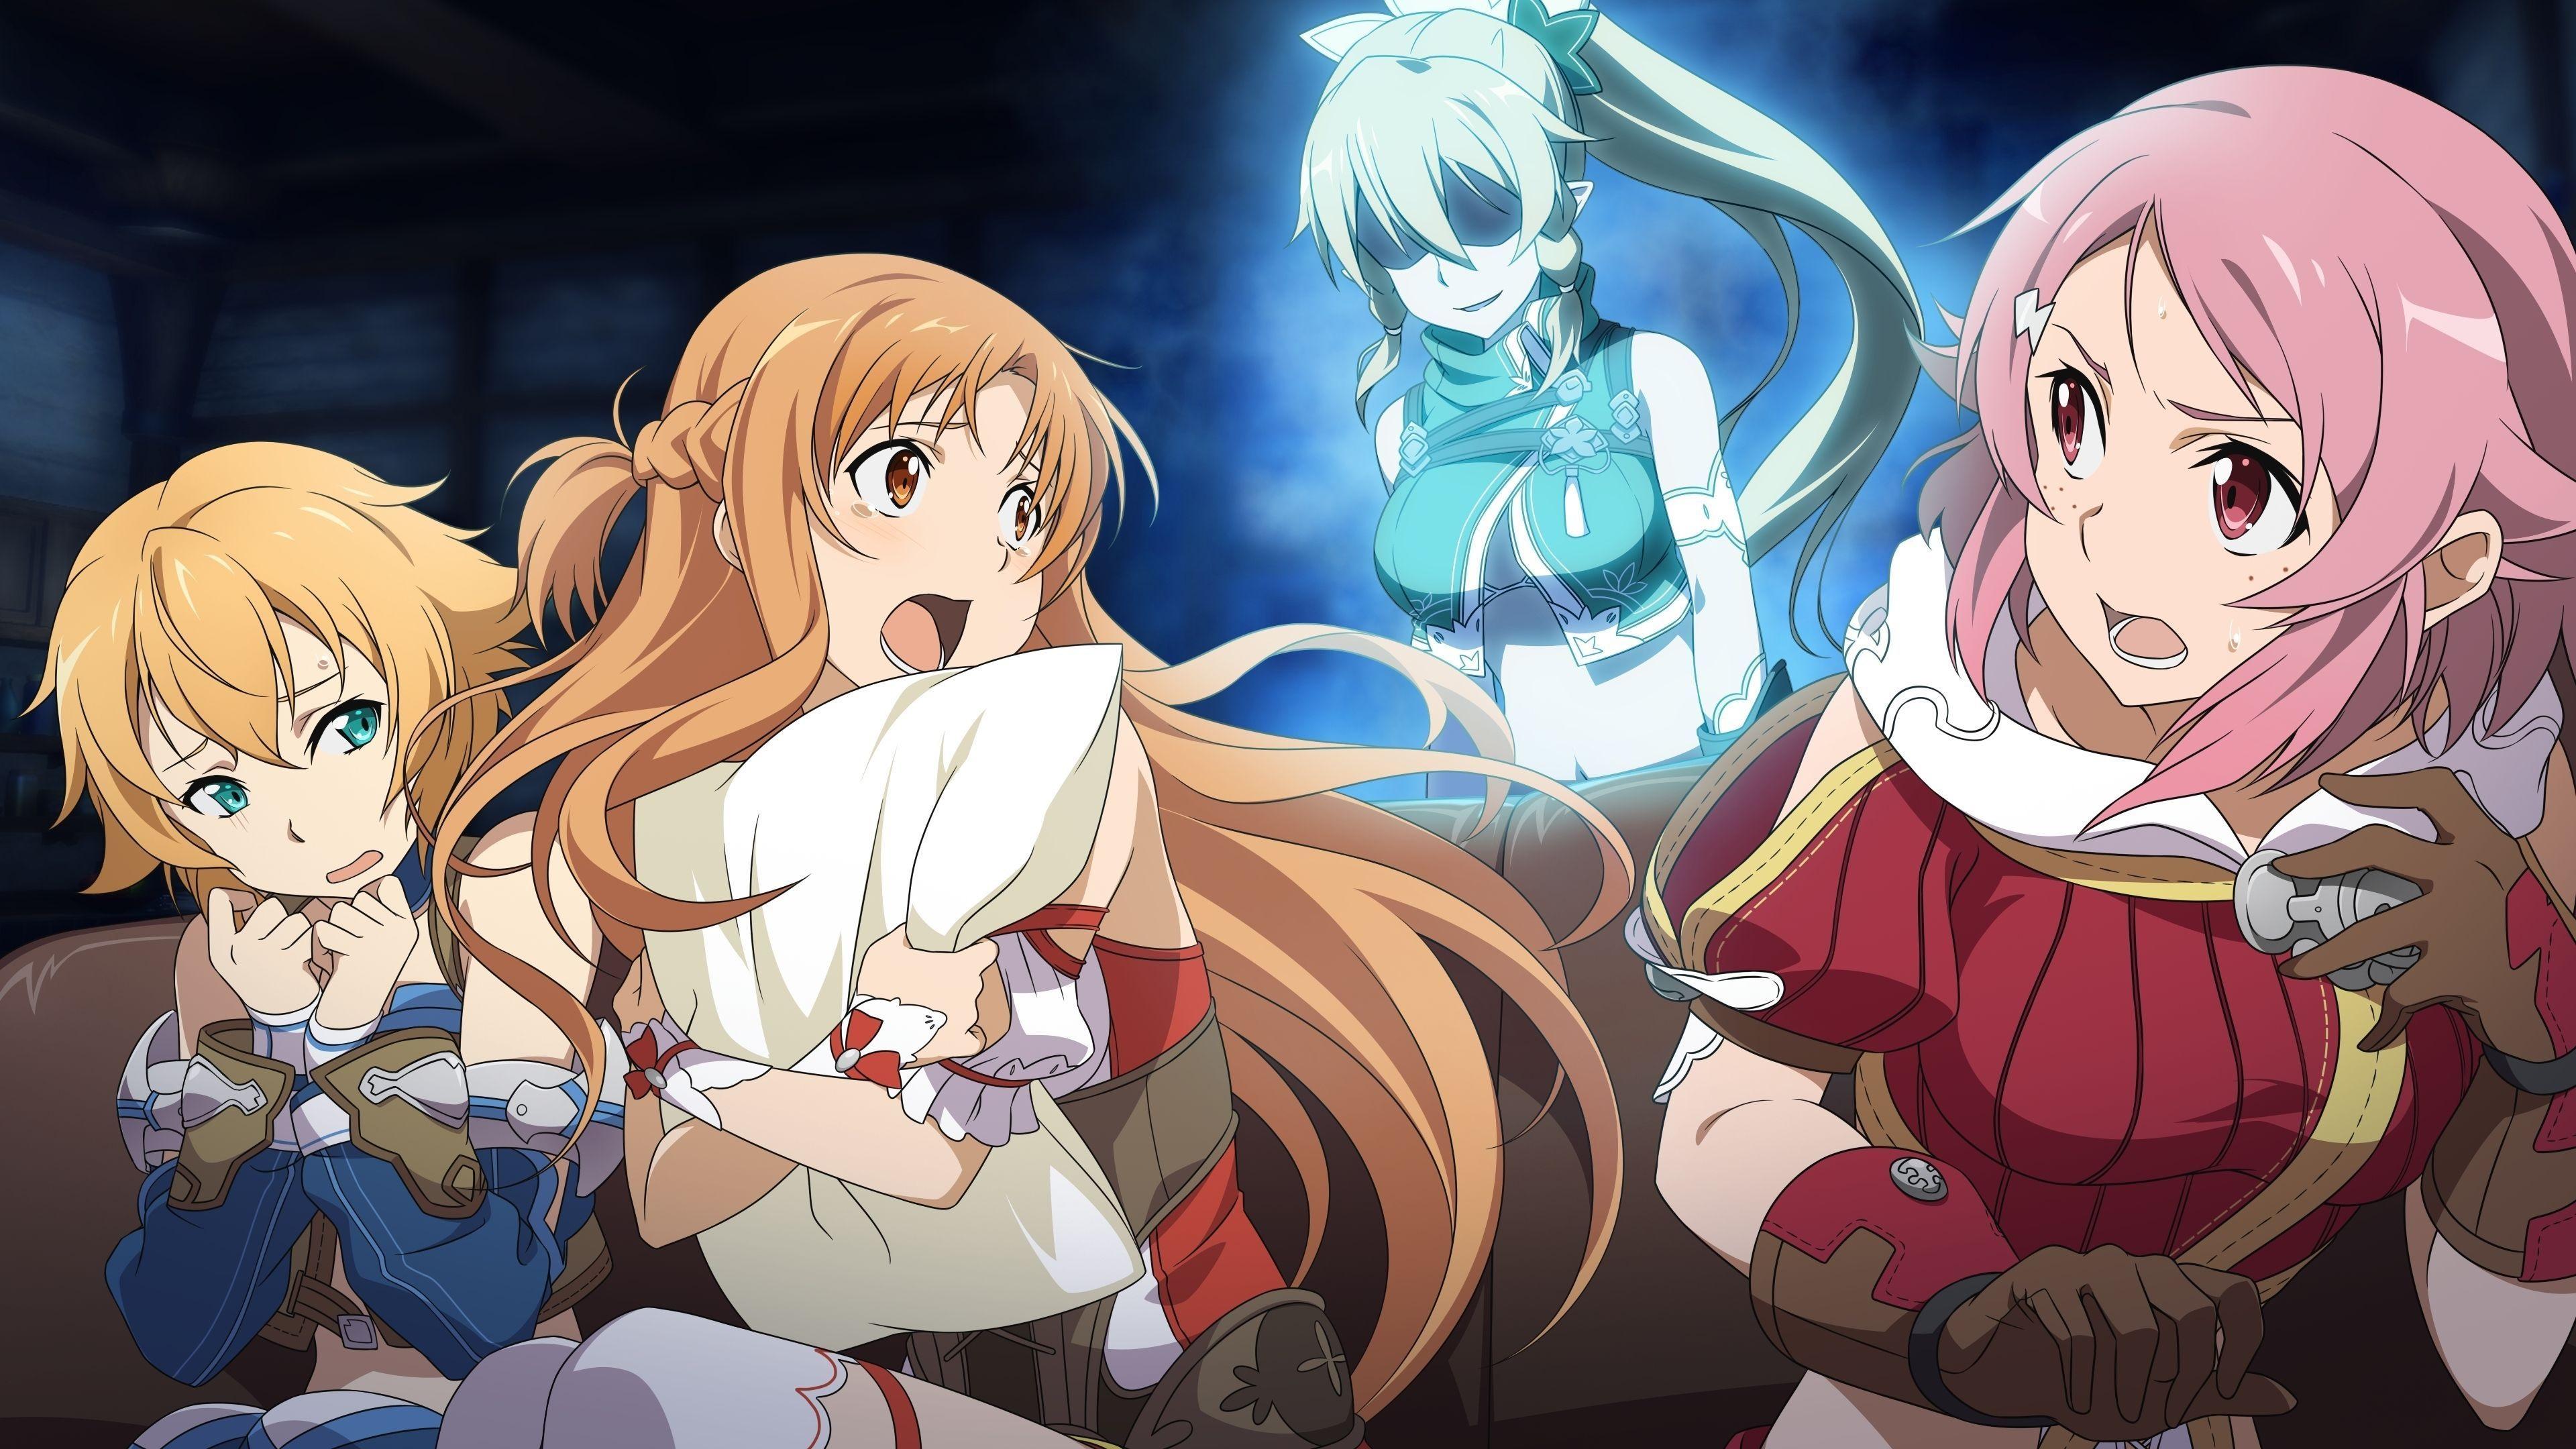 Manga Sword Art Online Liz Porn - Resized to 22% of original ...